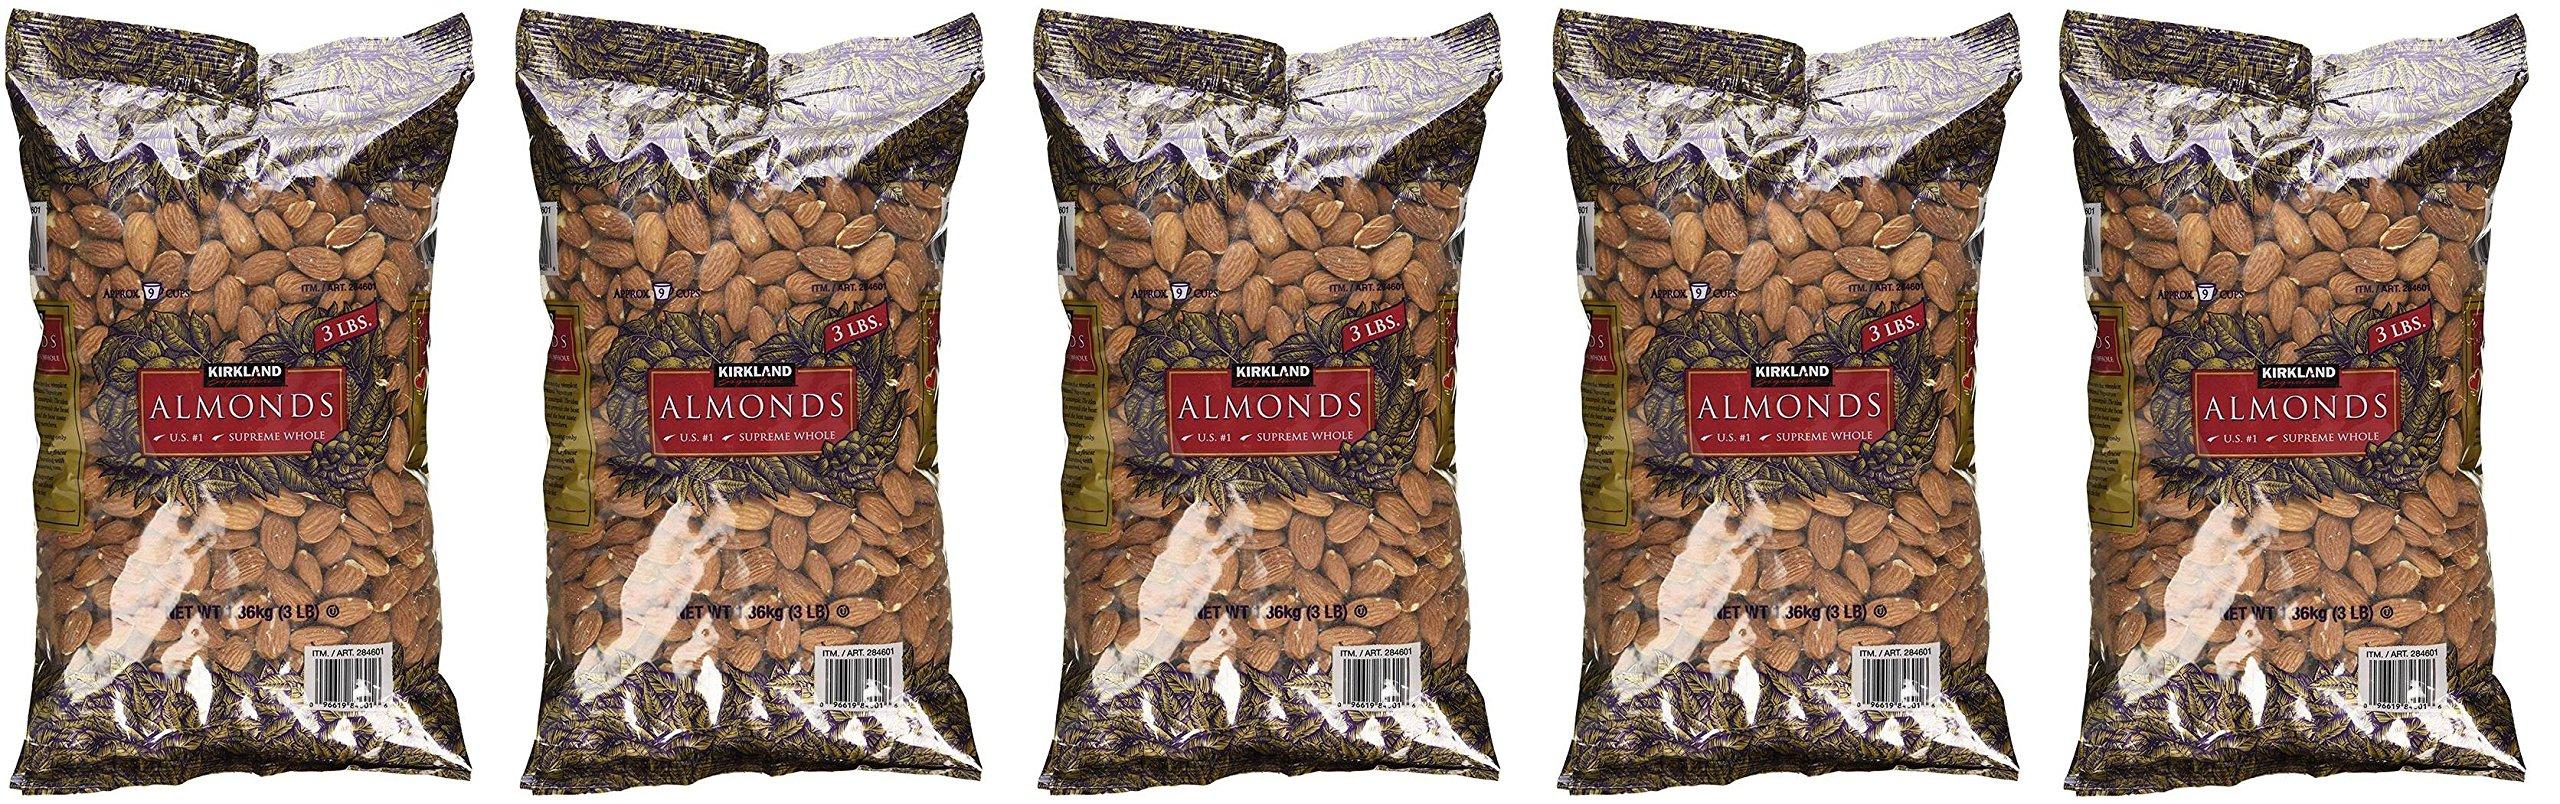 Kirkland Signature Supreme Whole Almonds, 5 Pack (3 Pounds)